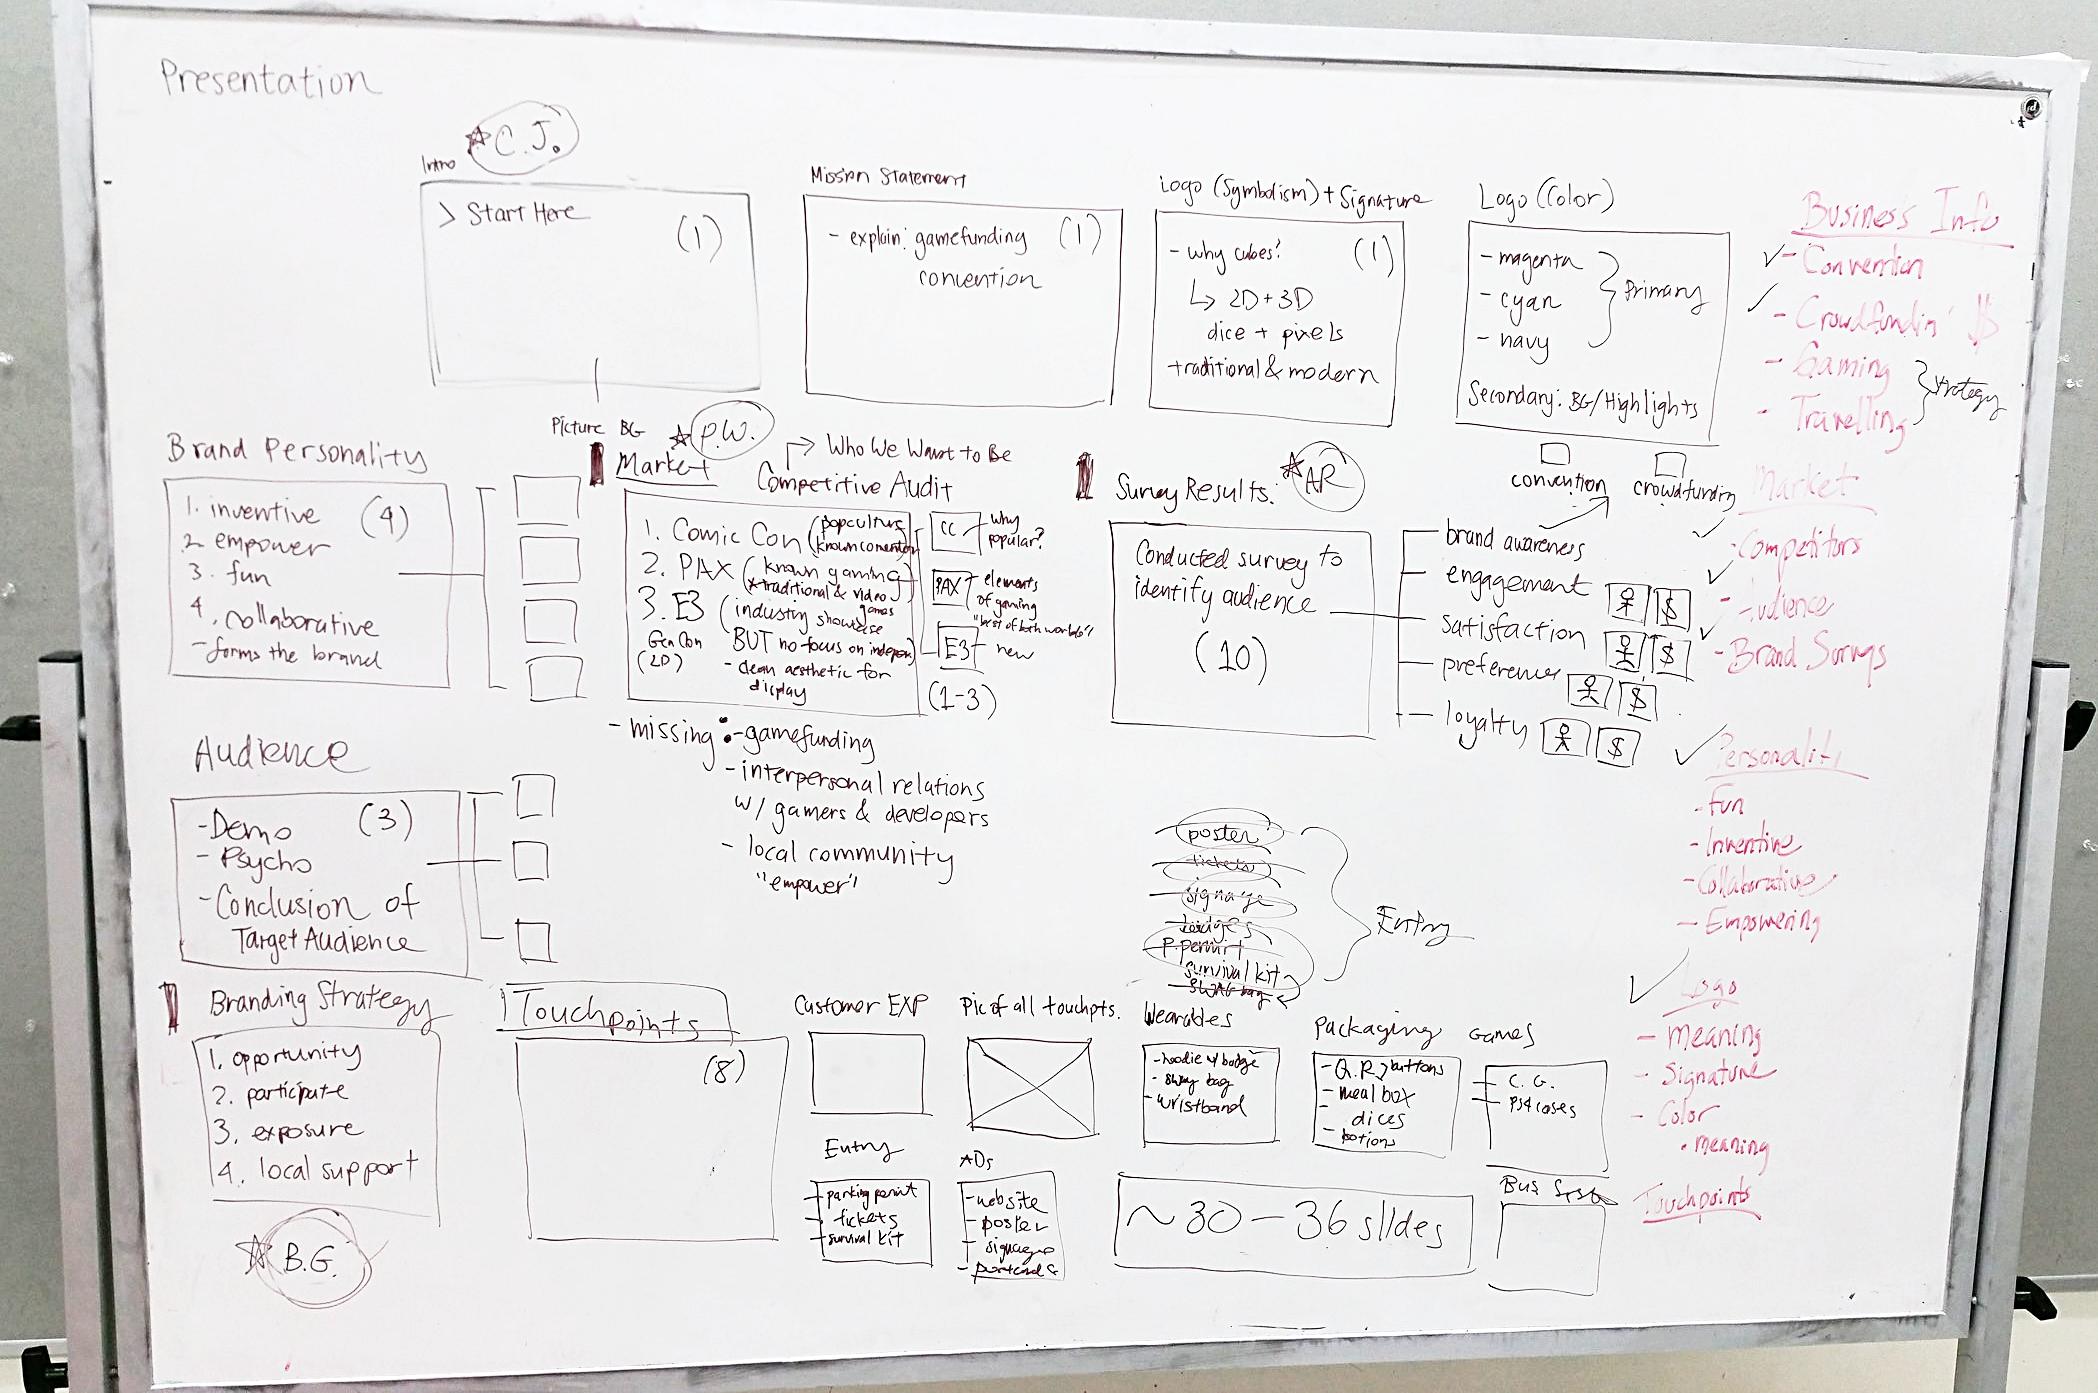 4_25_16 Presentation Outline.jpg